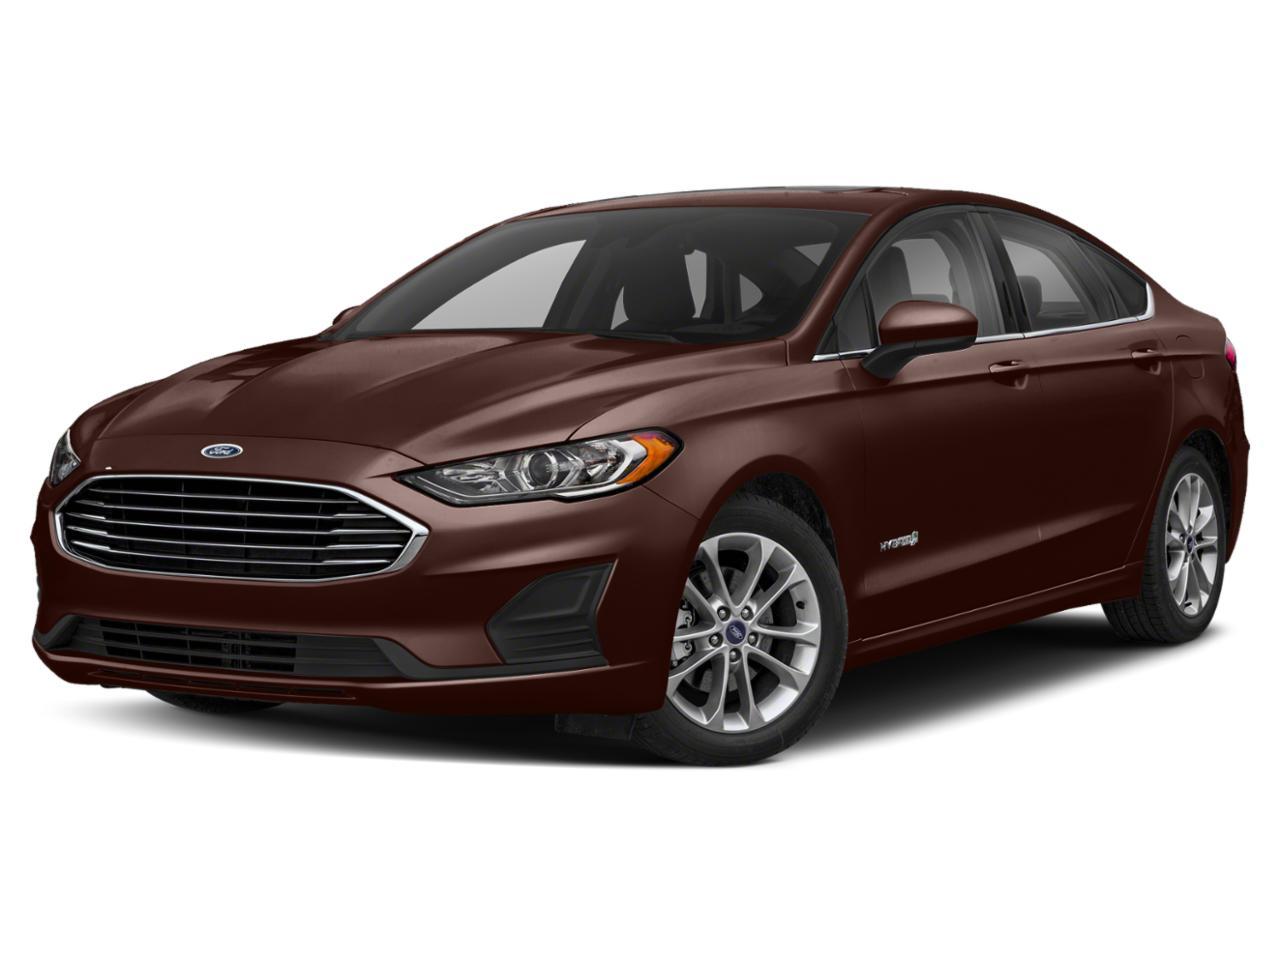 2019 Ford Fusion Hybrid TITANIUM 4dr Car Slide